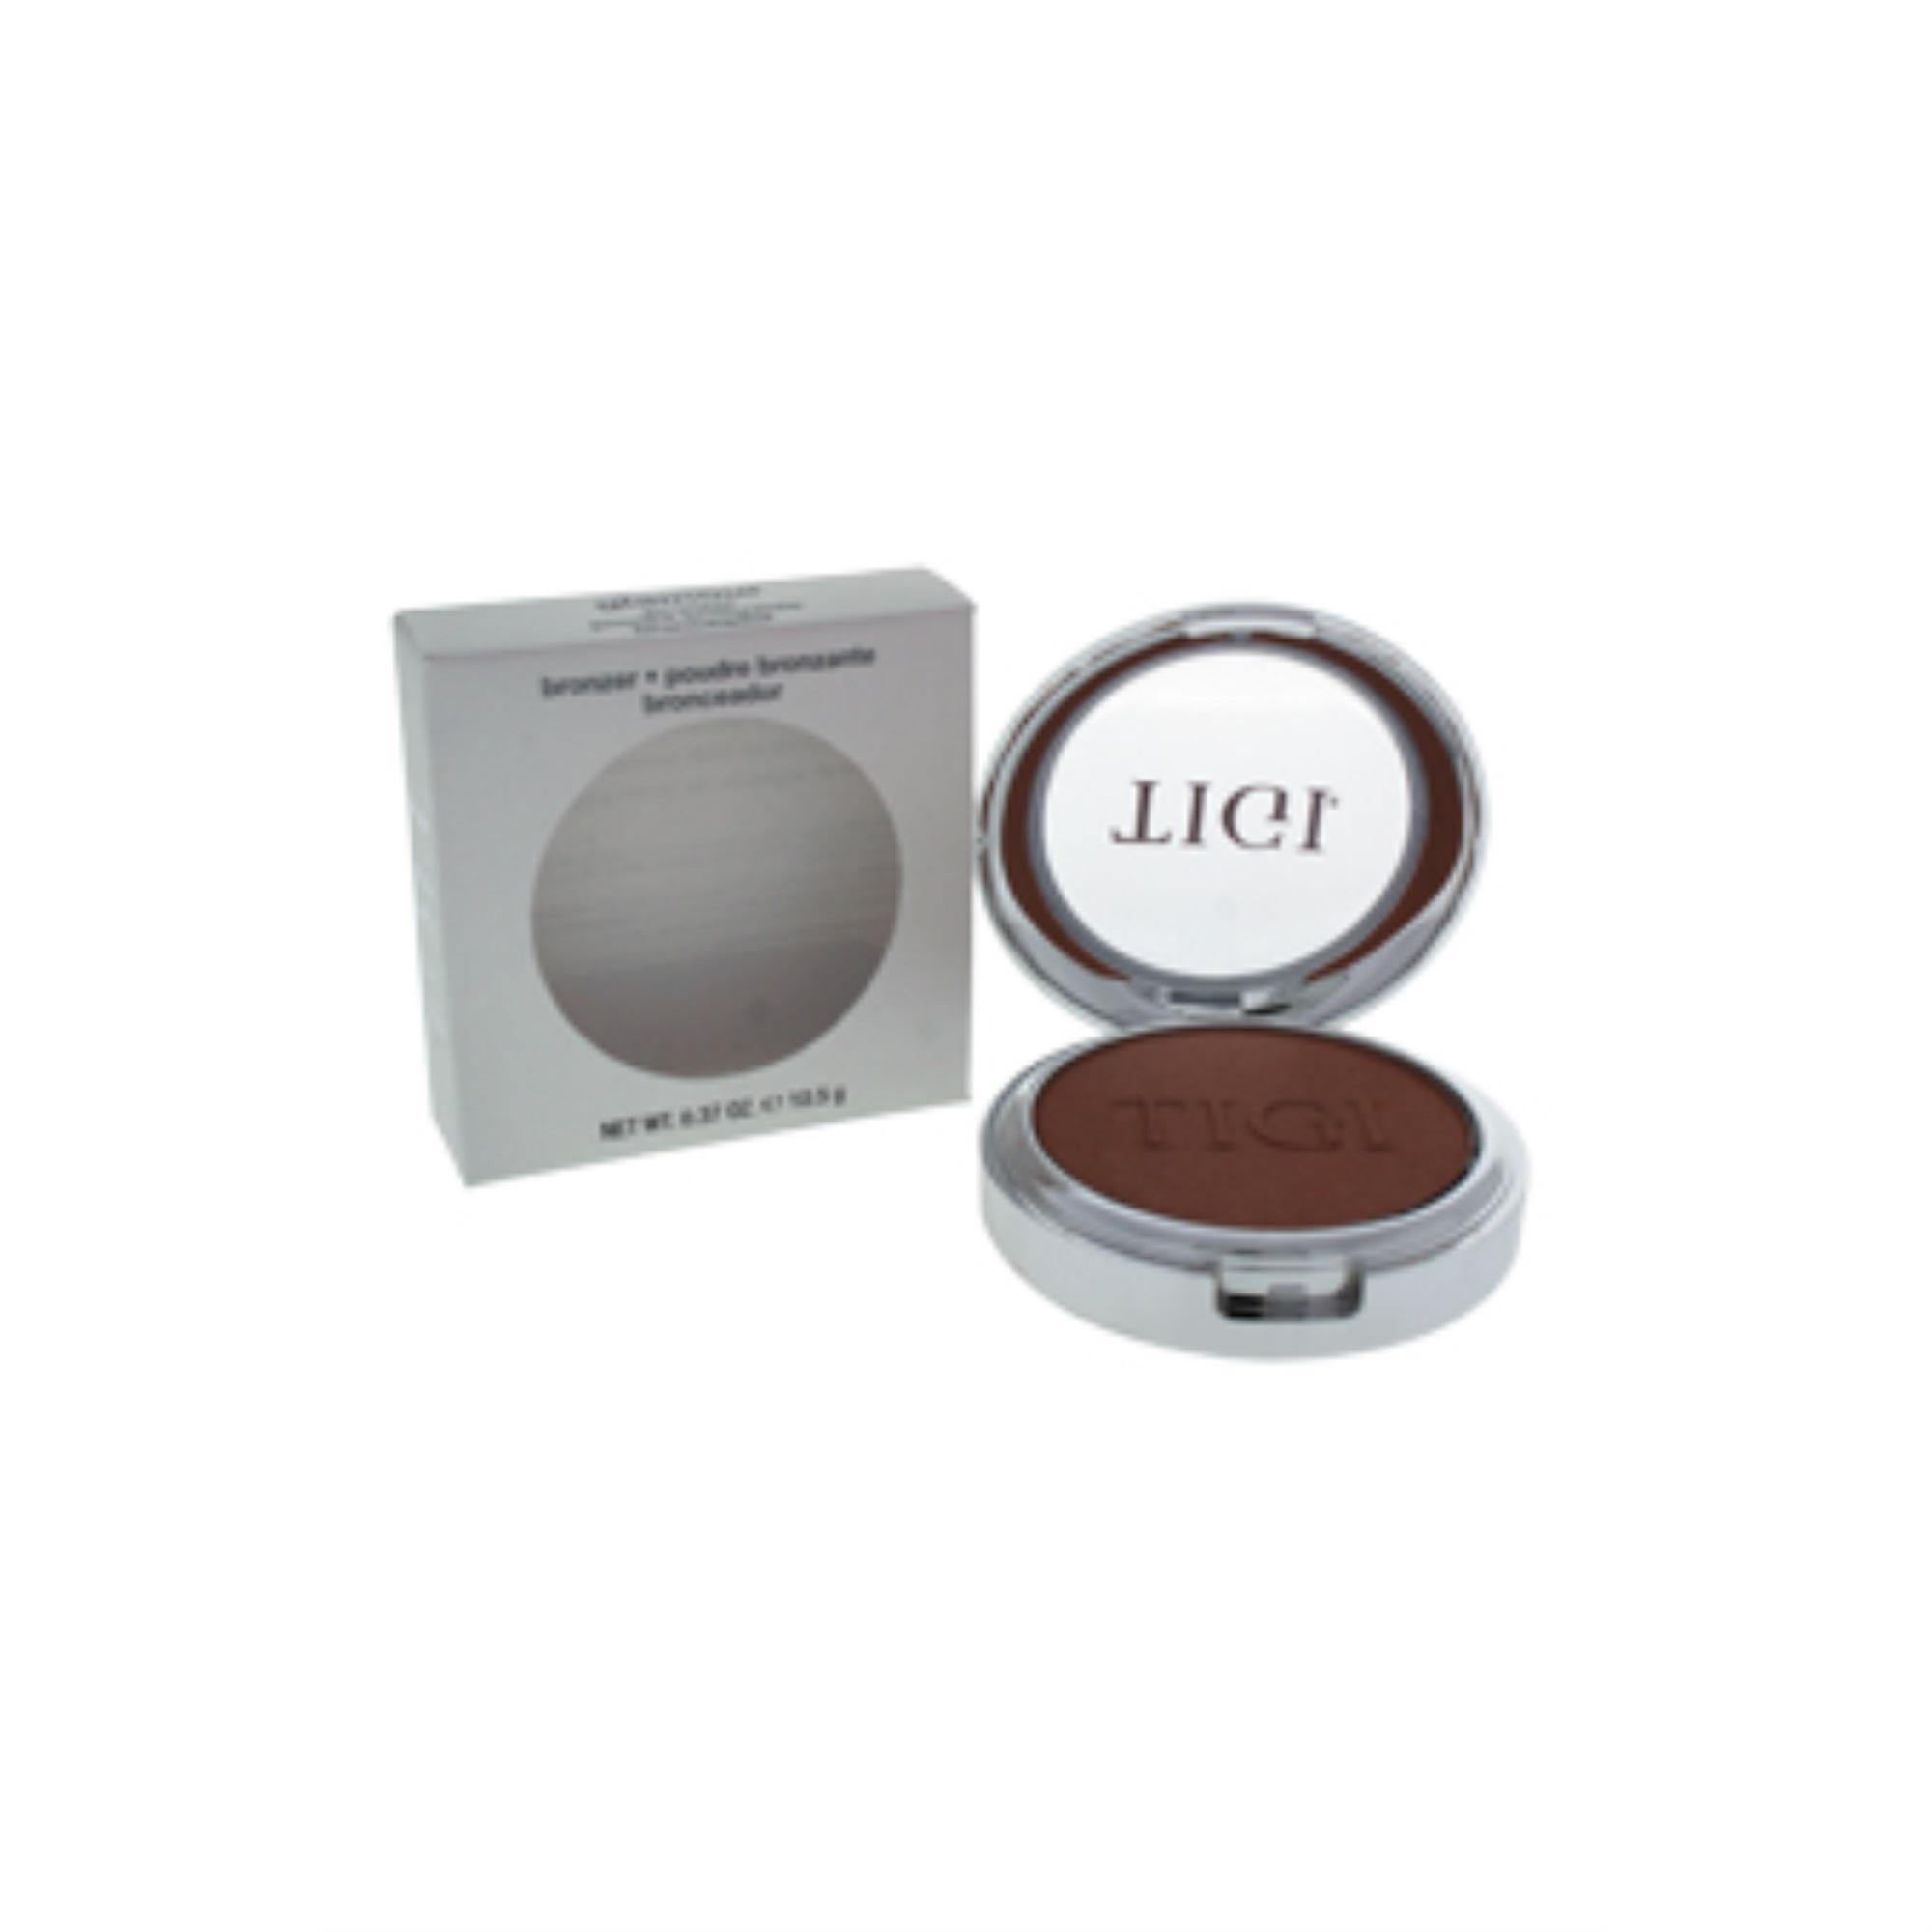 Bronzer - Glamour by TIGI for Women - 0.37 oz Bronzer - image 2 de 2